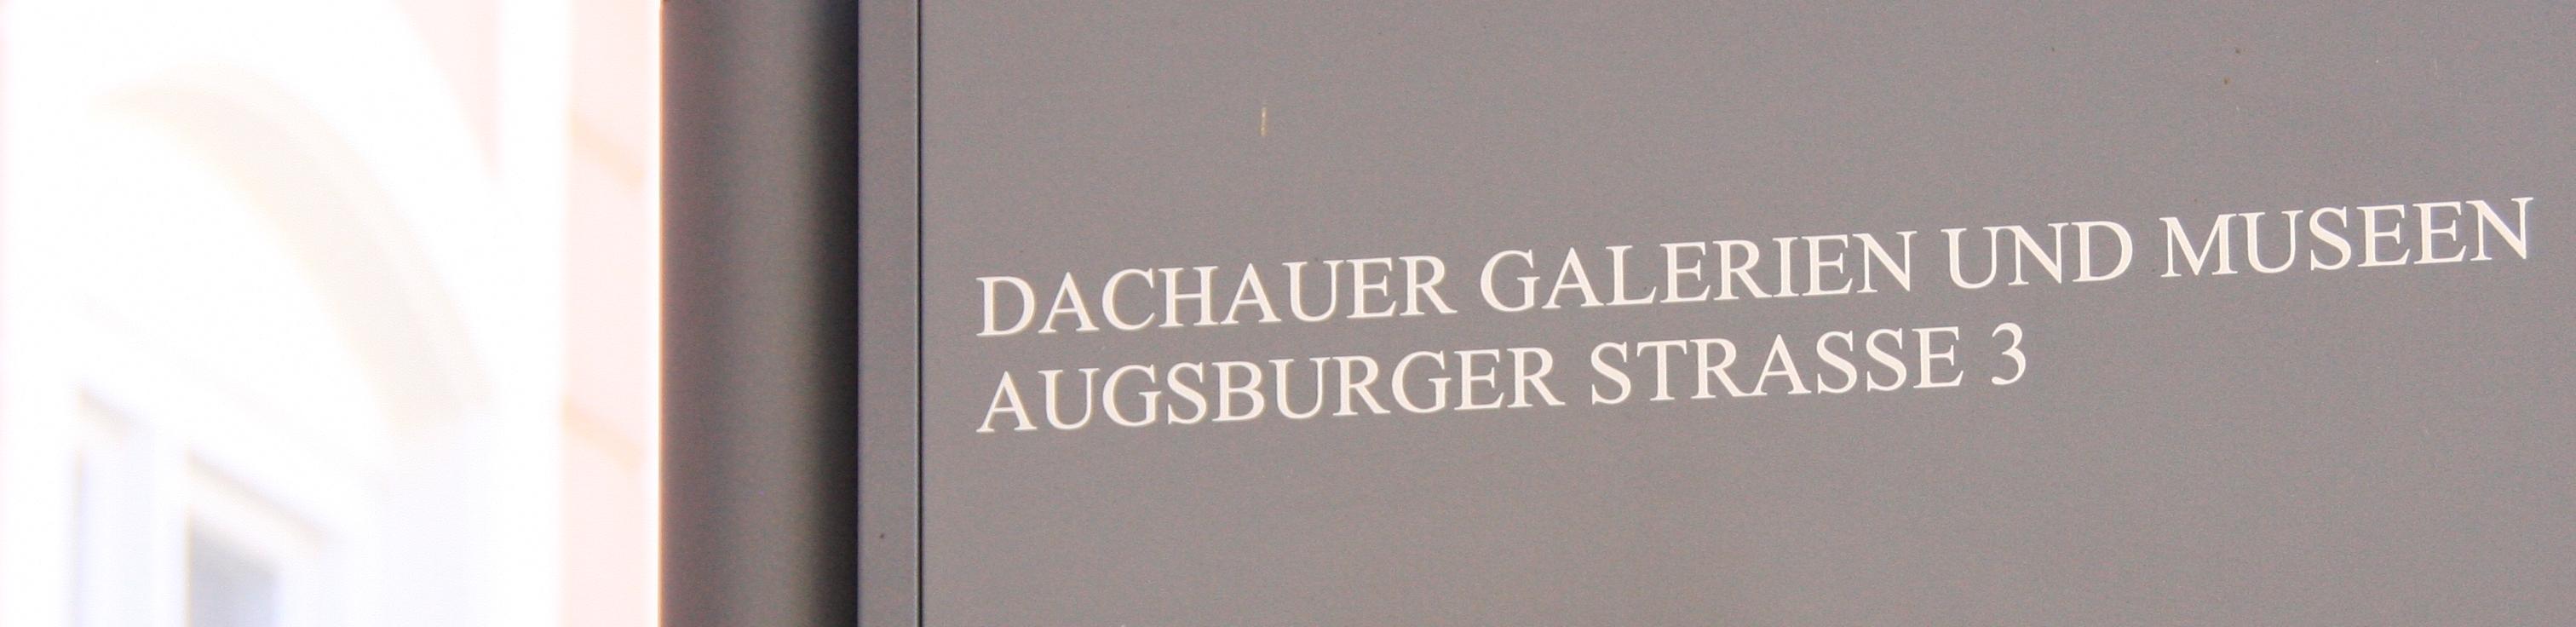 Bezirksmuseum Dachau Augsburger Str. 3 85221 Dachau Tel 08131/5675-0